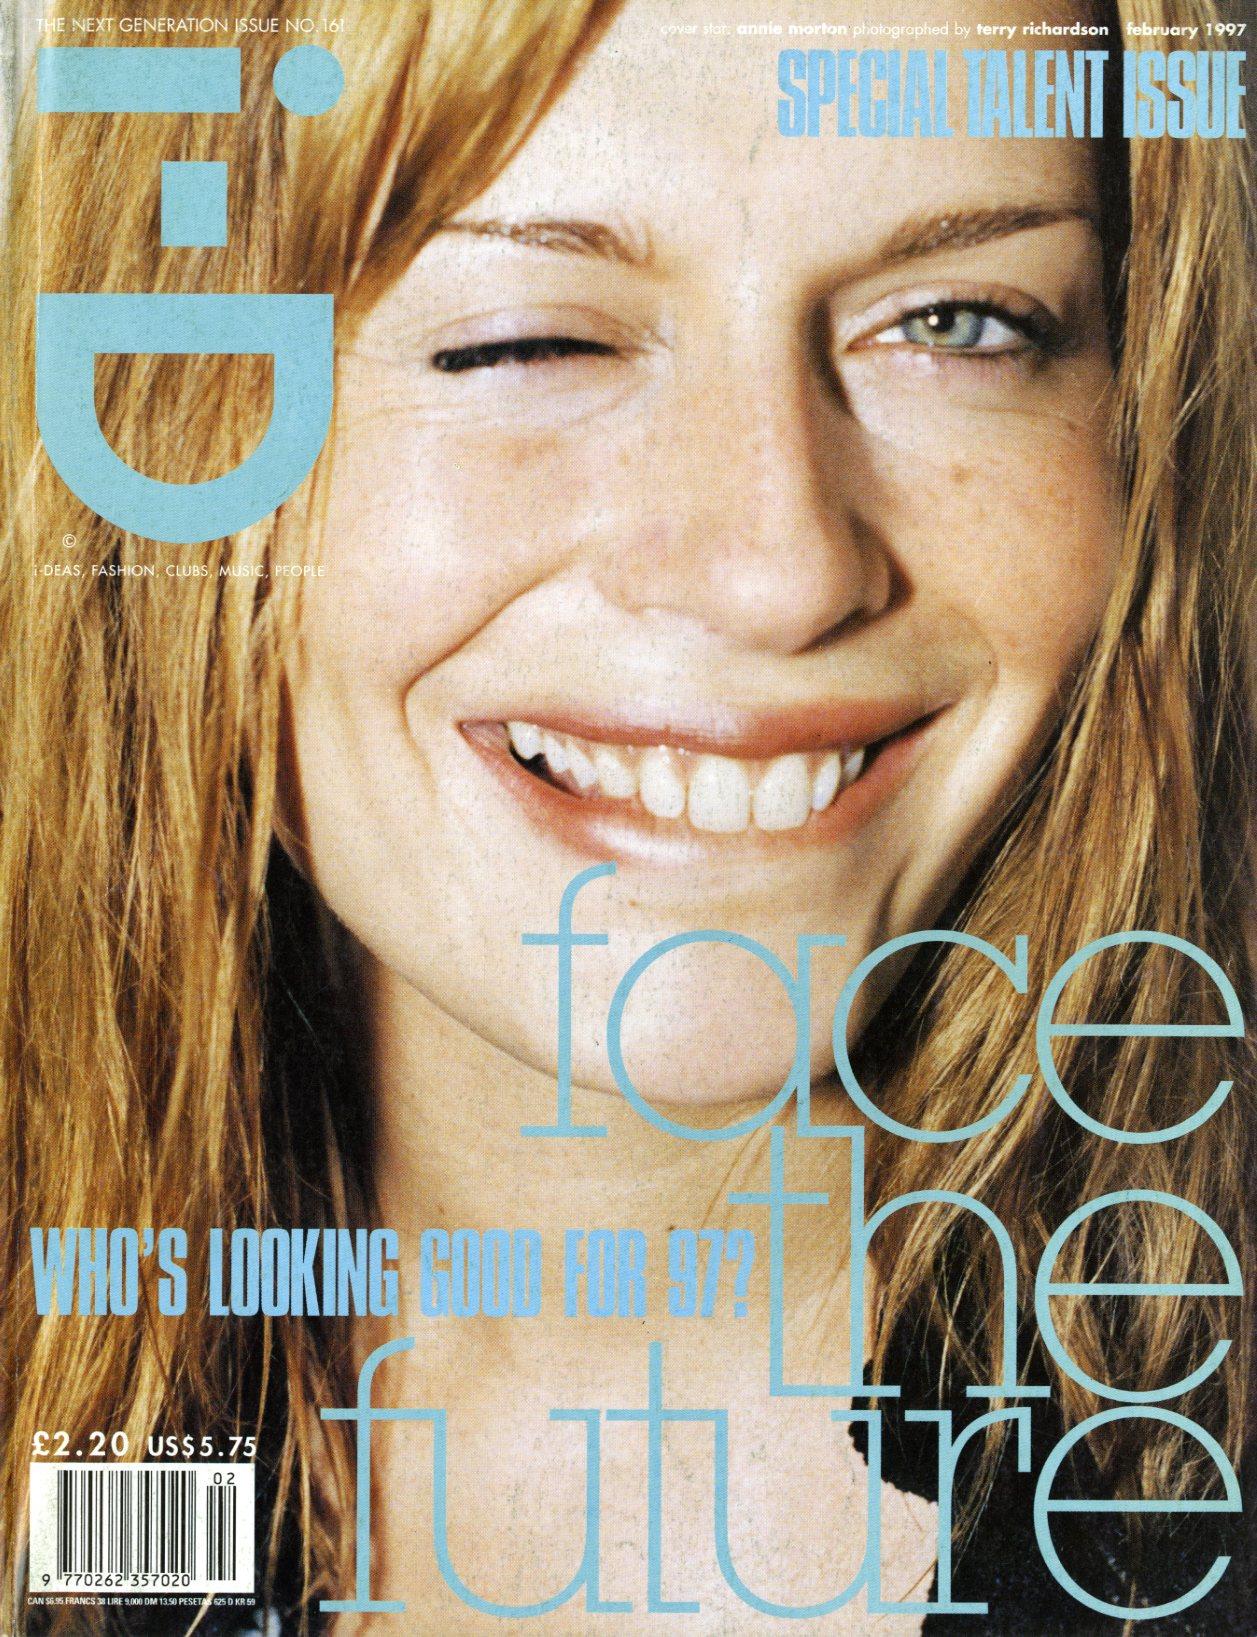 Idjut Boys, i-D, Magazine, February, 1997, DJs Of The Month